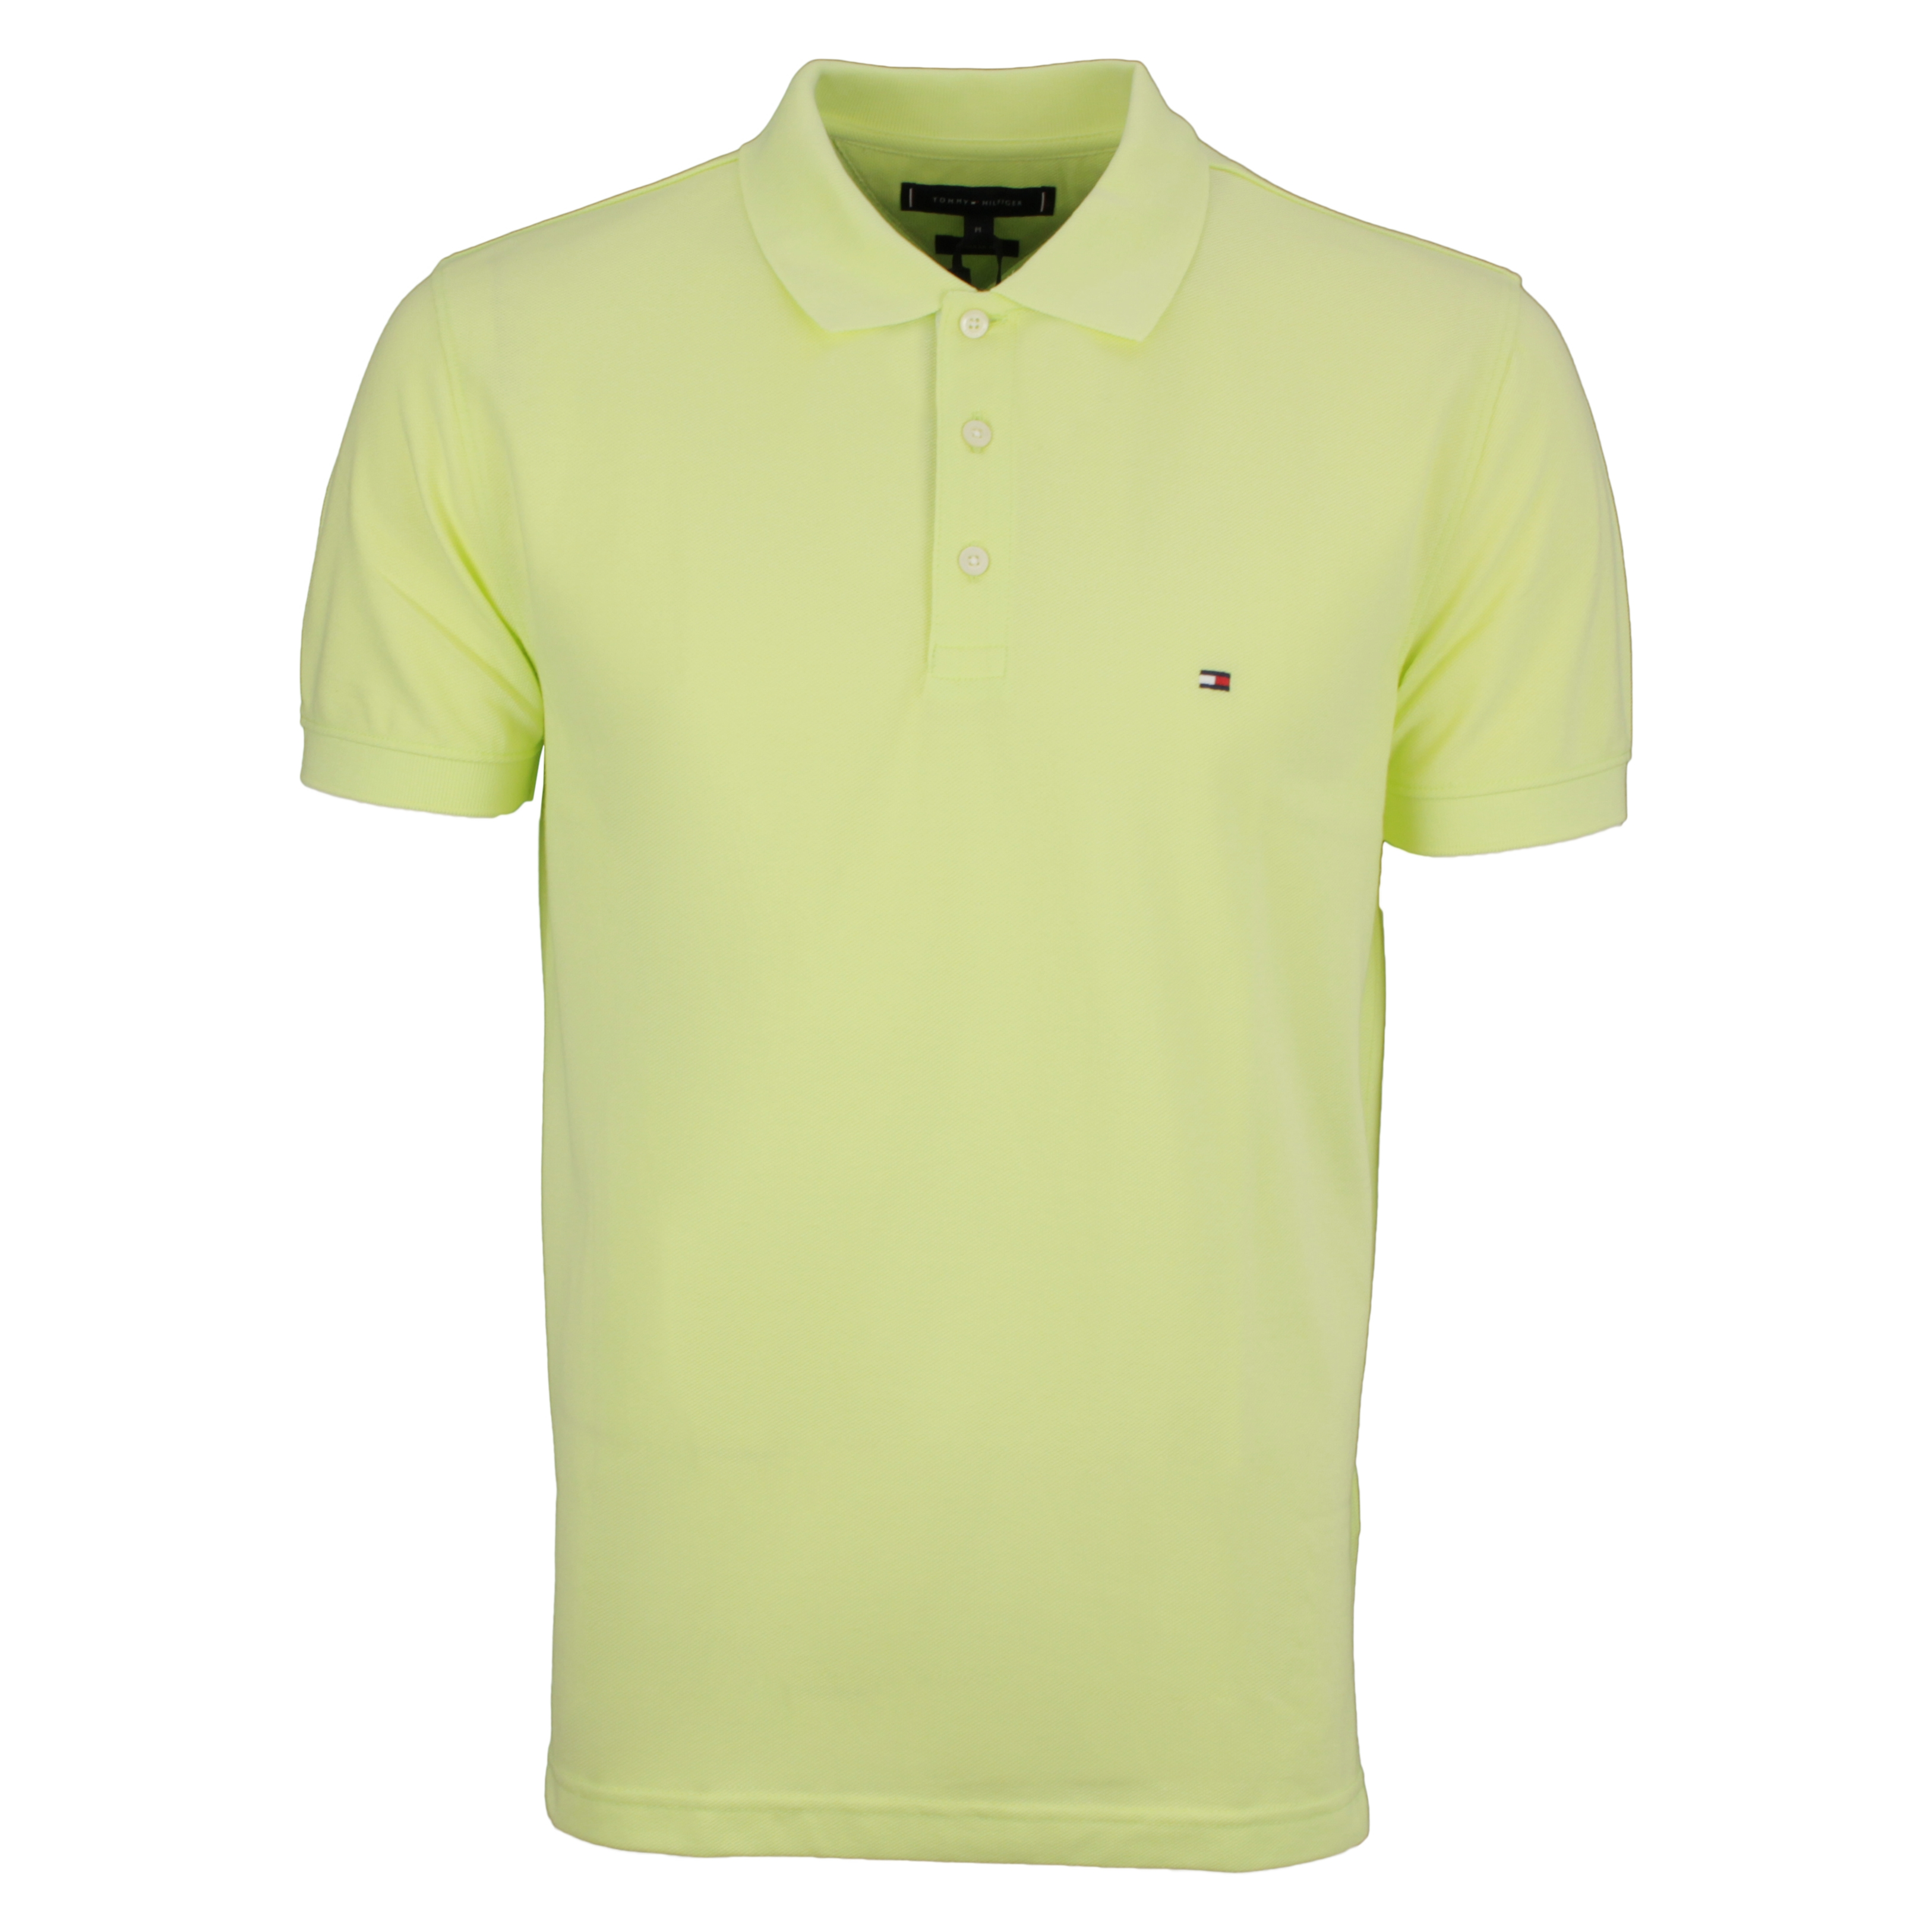 Tommy Hilfiger Polo Shirt Contrast Placket gelb MW0MW19379 ZQL-yellow